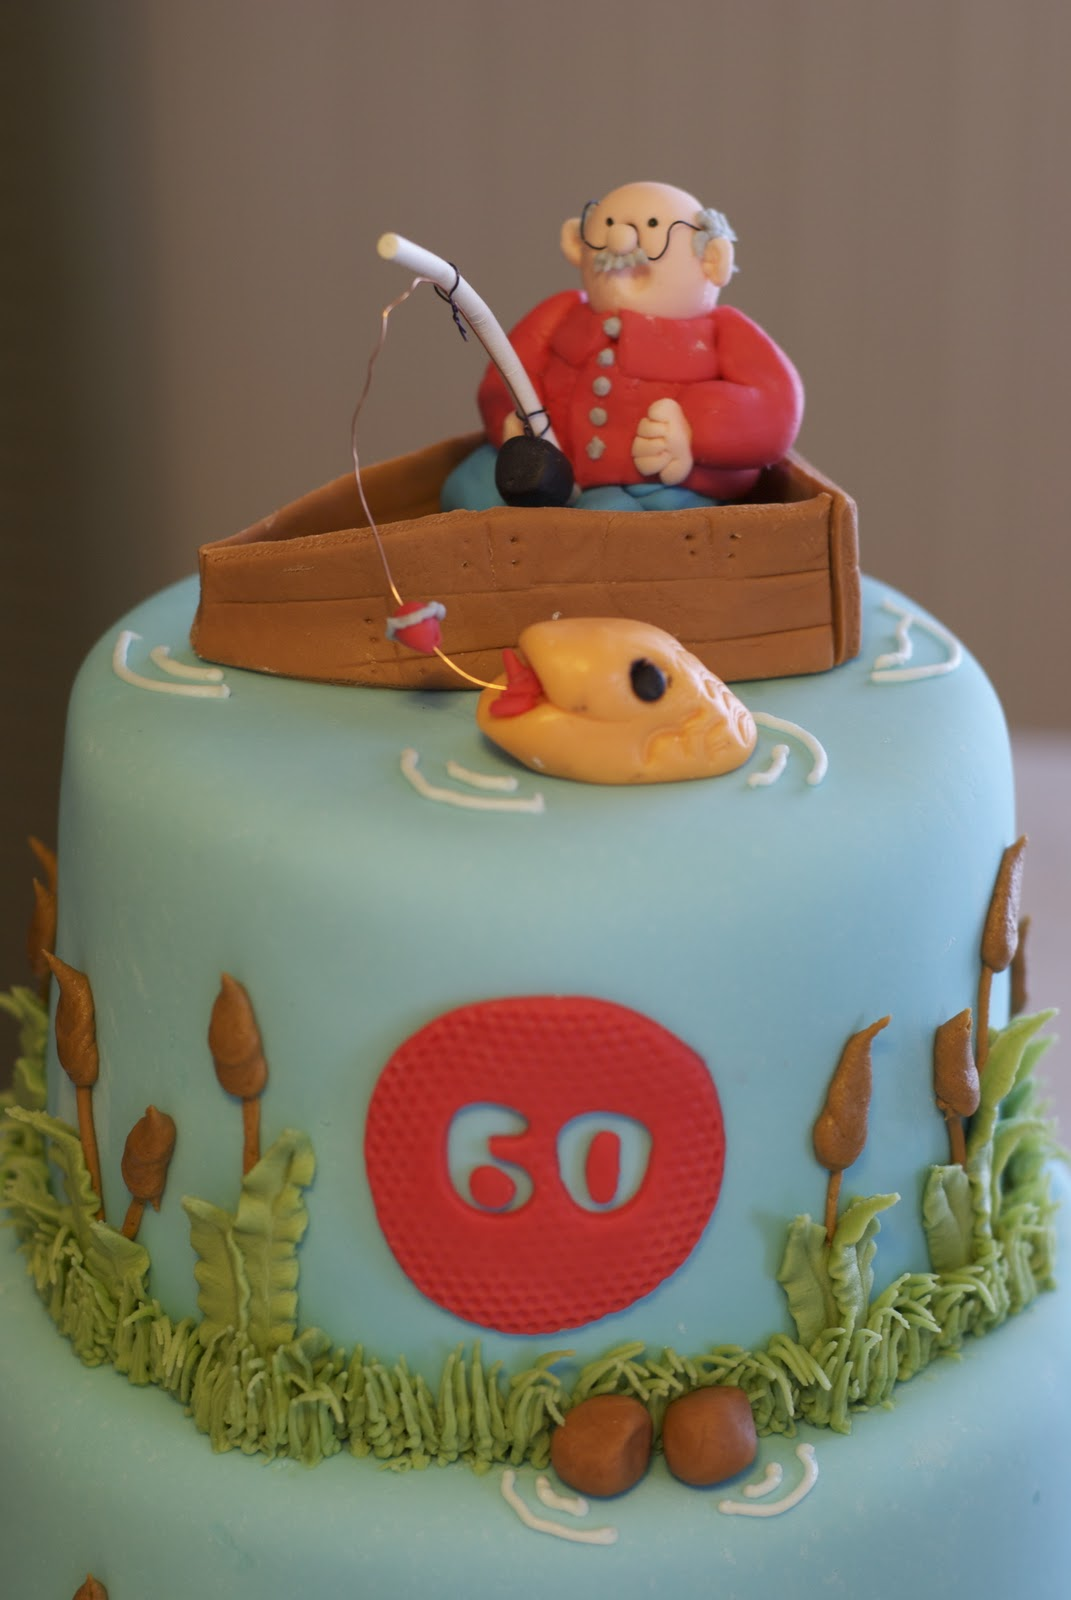 Awe Inspiring 9 Mans 60Th Birthday Cakes Fondant Photo Birthday Cakes For Personalised Birthday Cards Veneteletsinfo